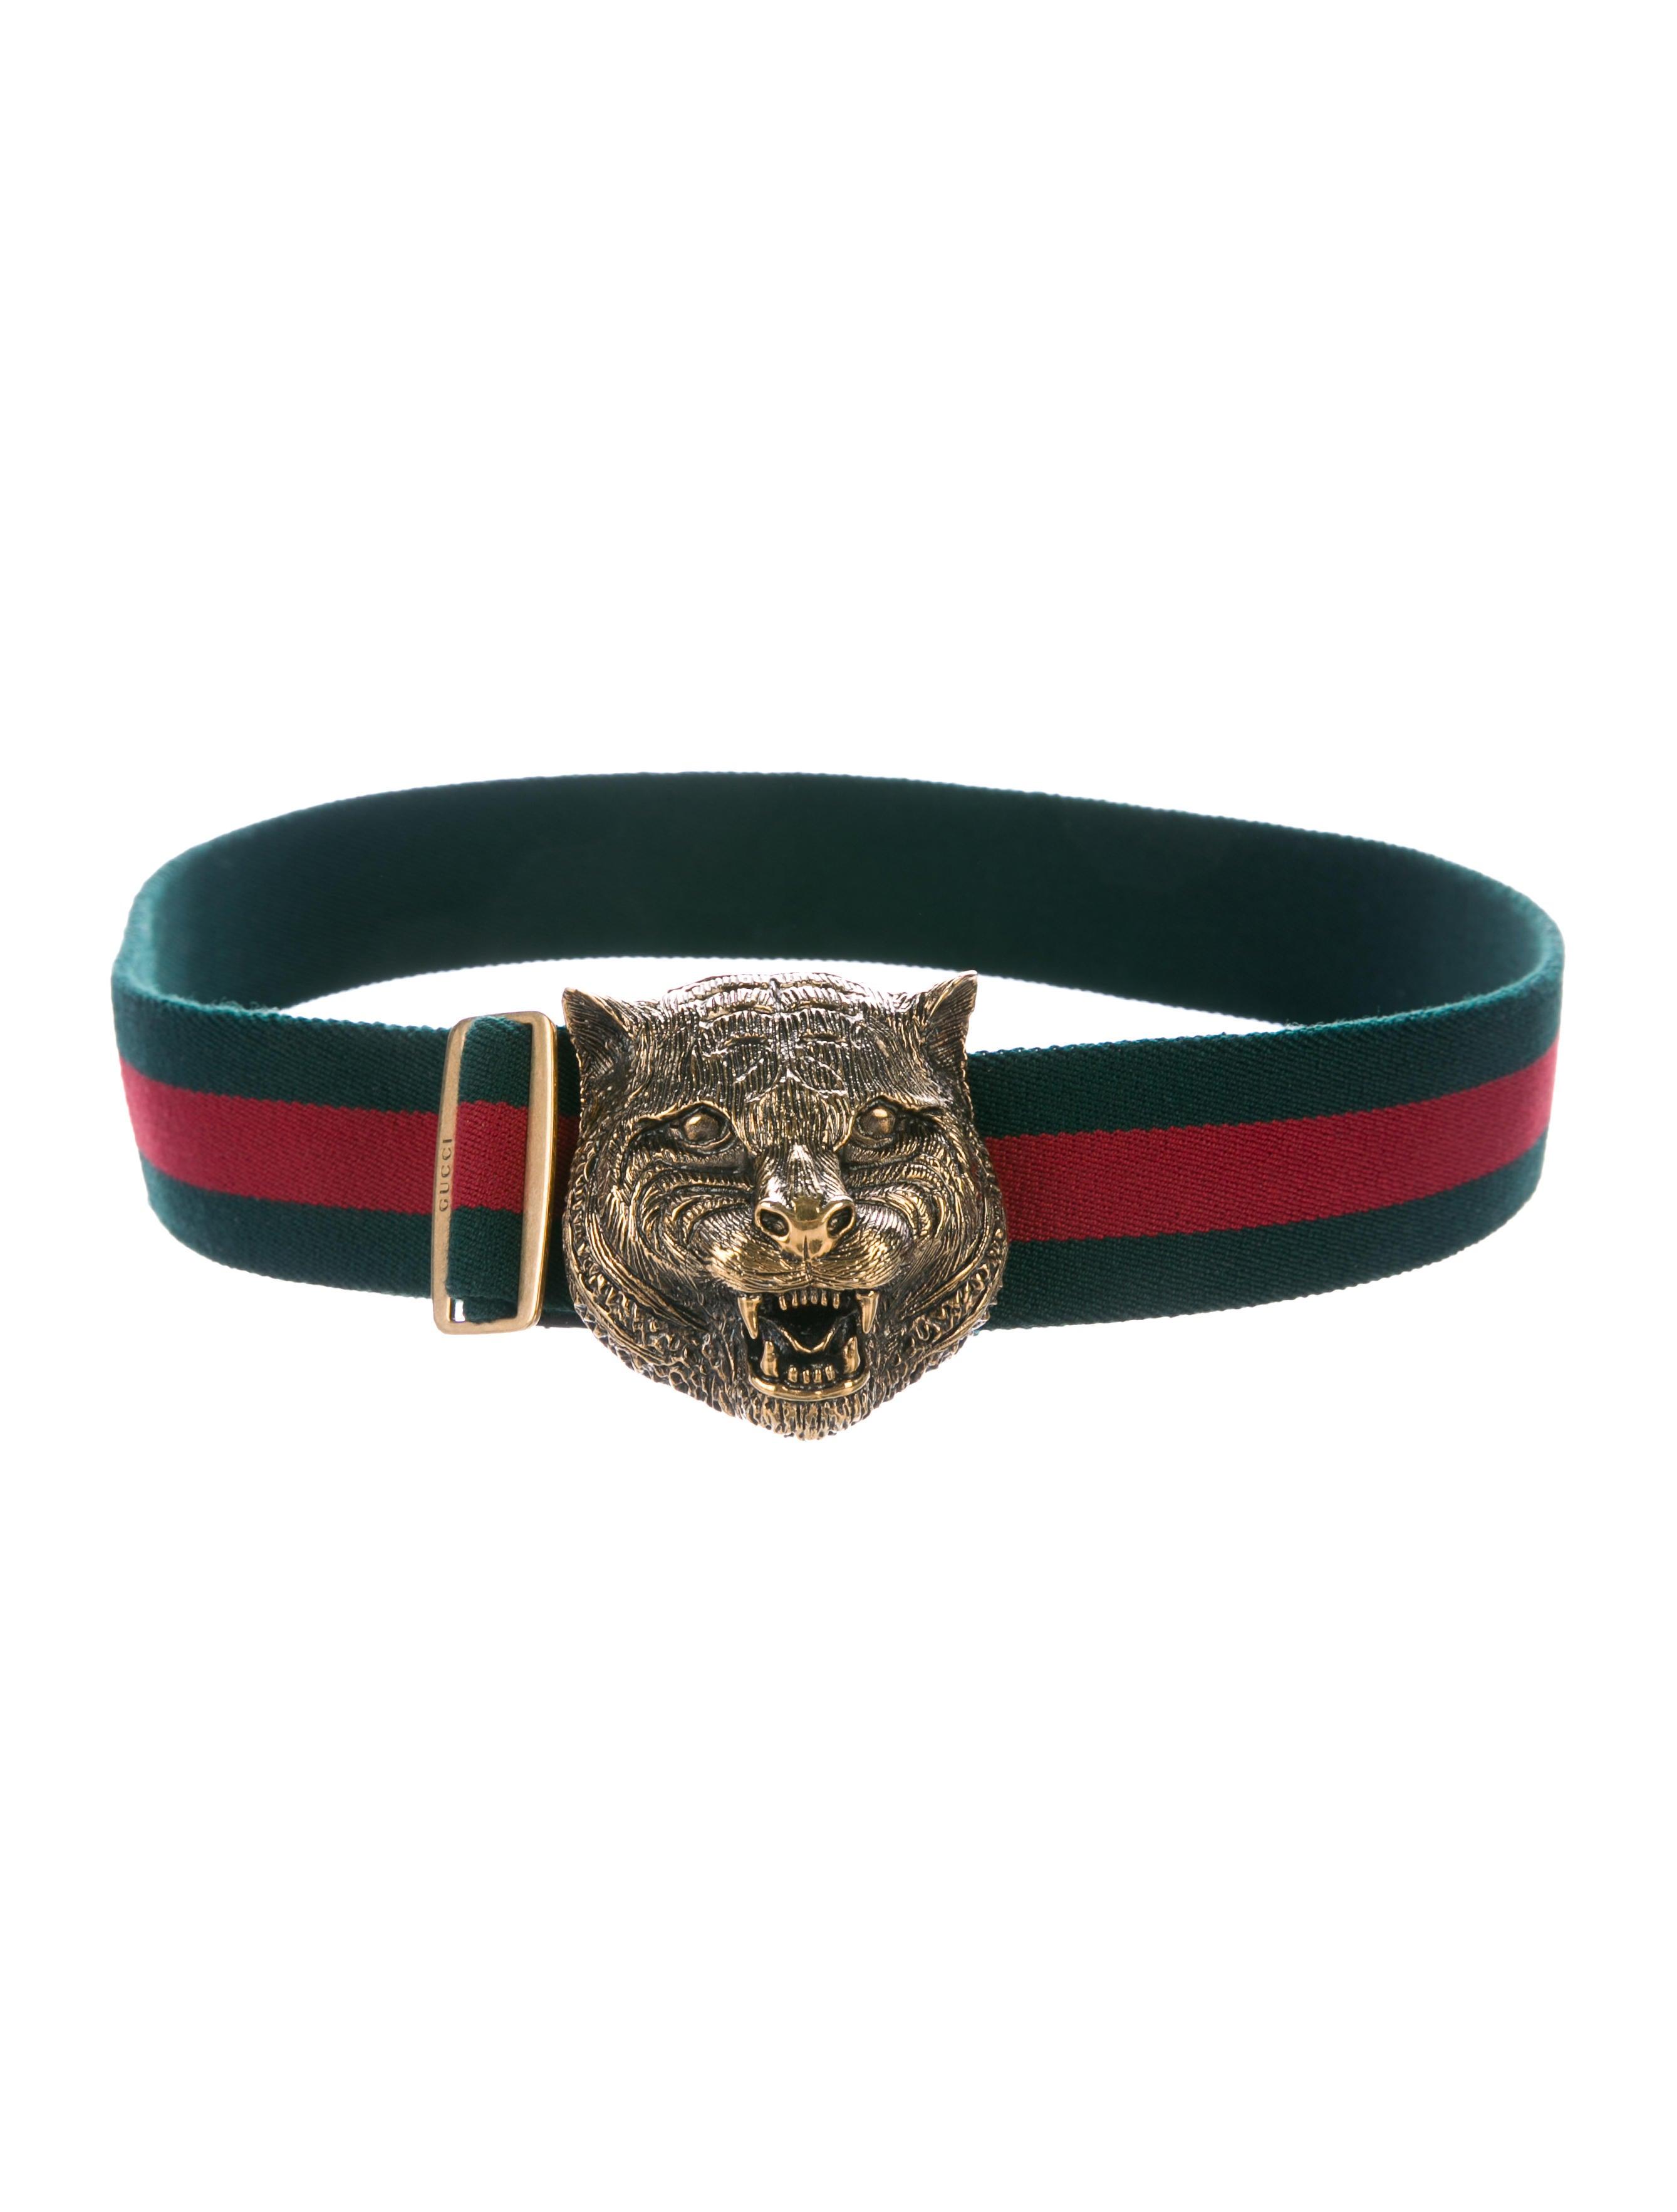 e187693c8e5 Gucci Feline Buckle Waist Belt w  Logo Web - Accessories - GUC205936 ...